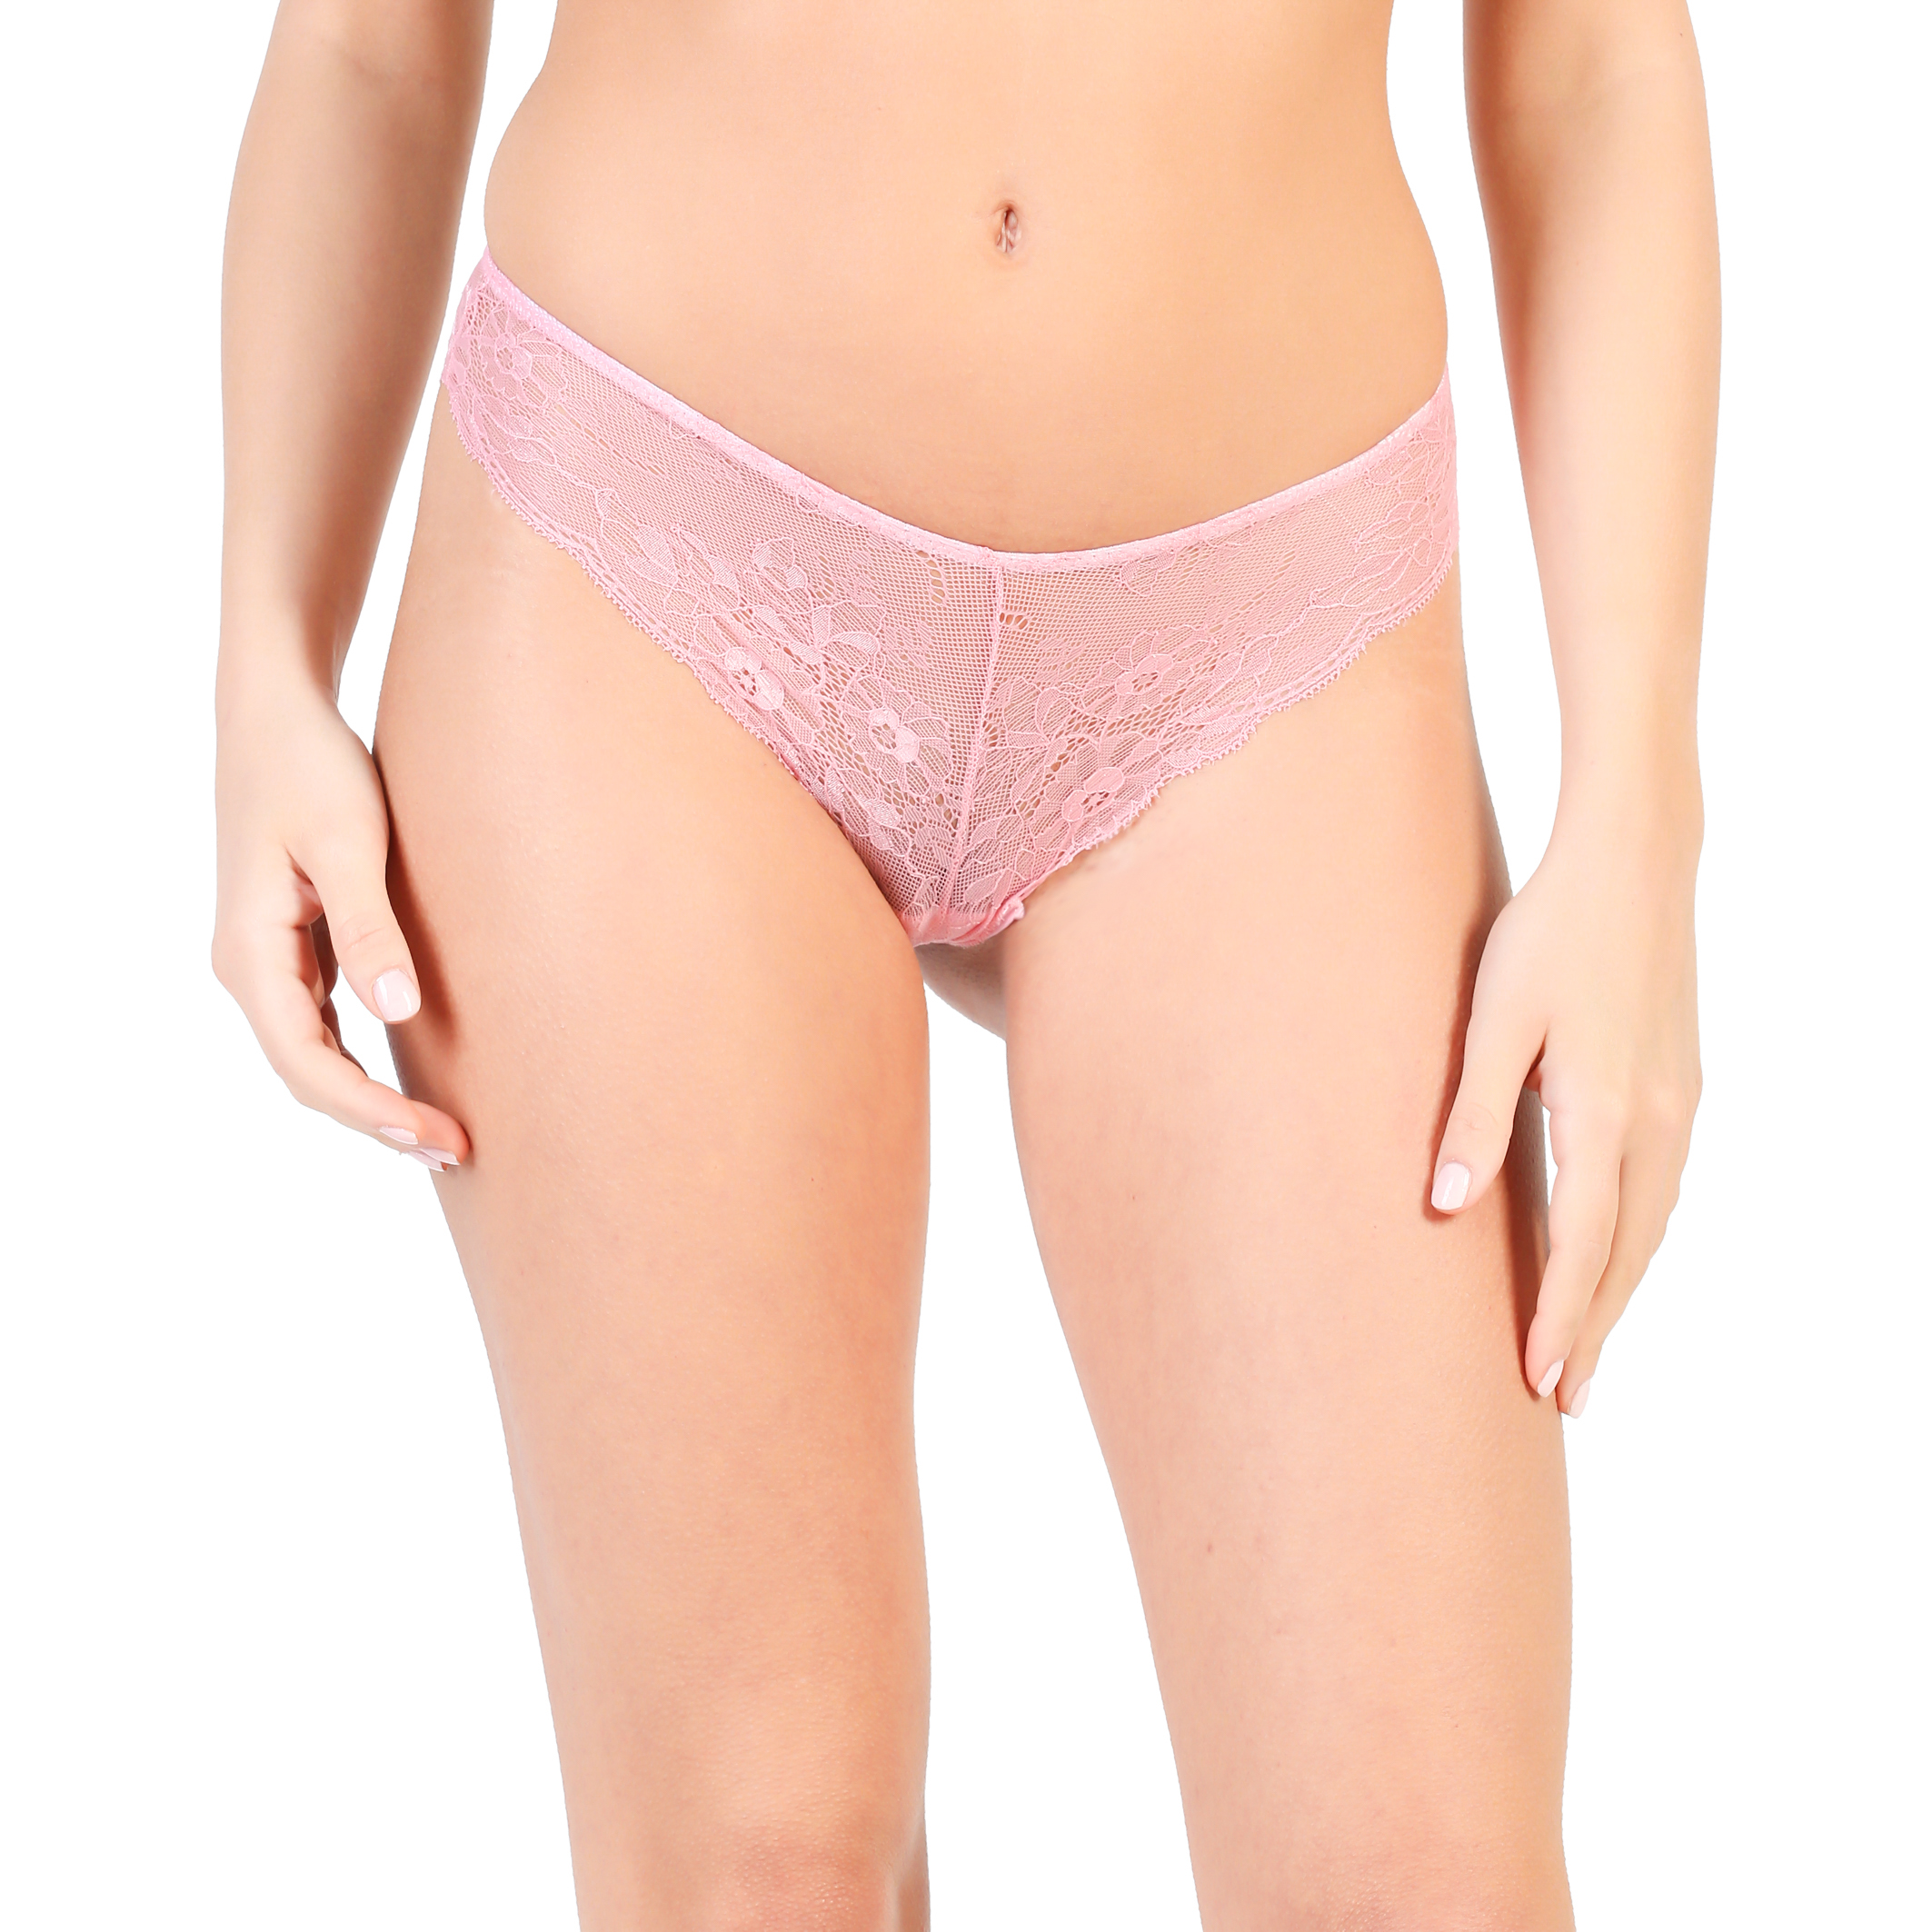 Pierre Cardin underwear PCW_LAIZE Donna Rosa 87844